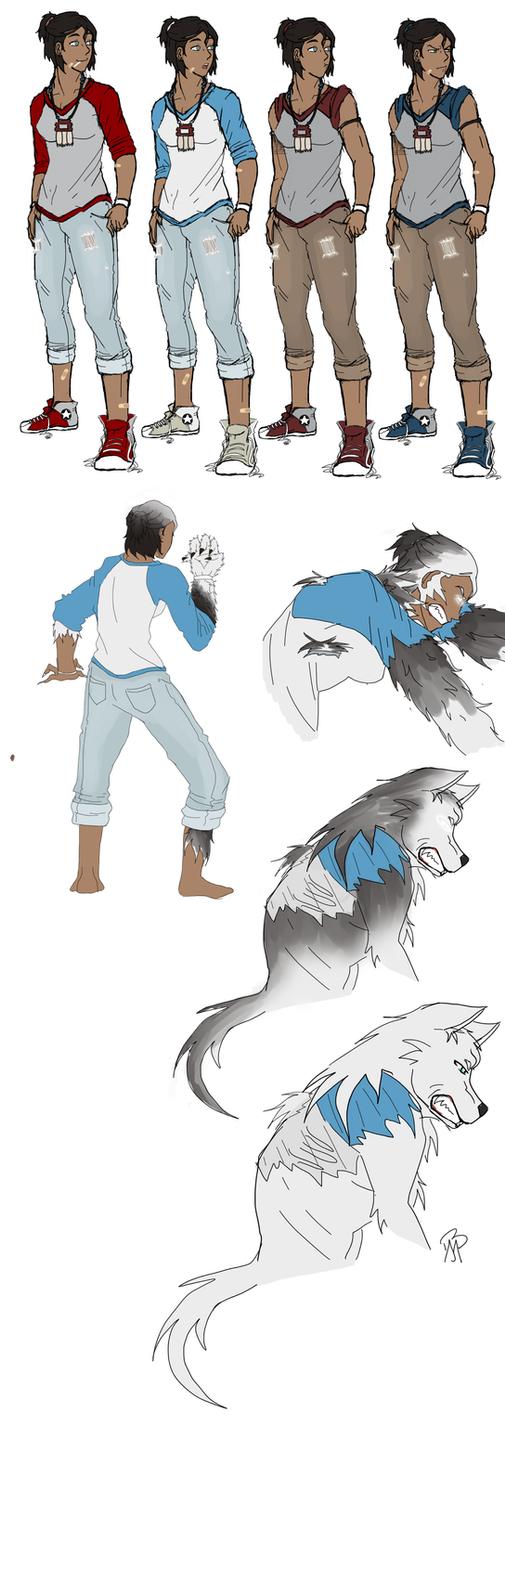 Korra Wolf AU Drawings by JustiCmo